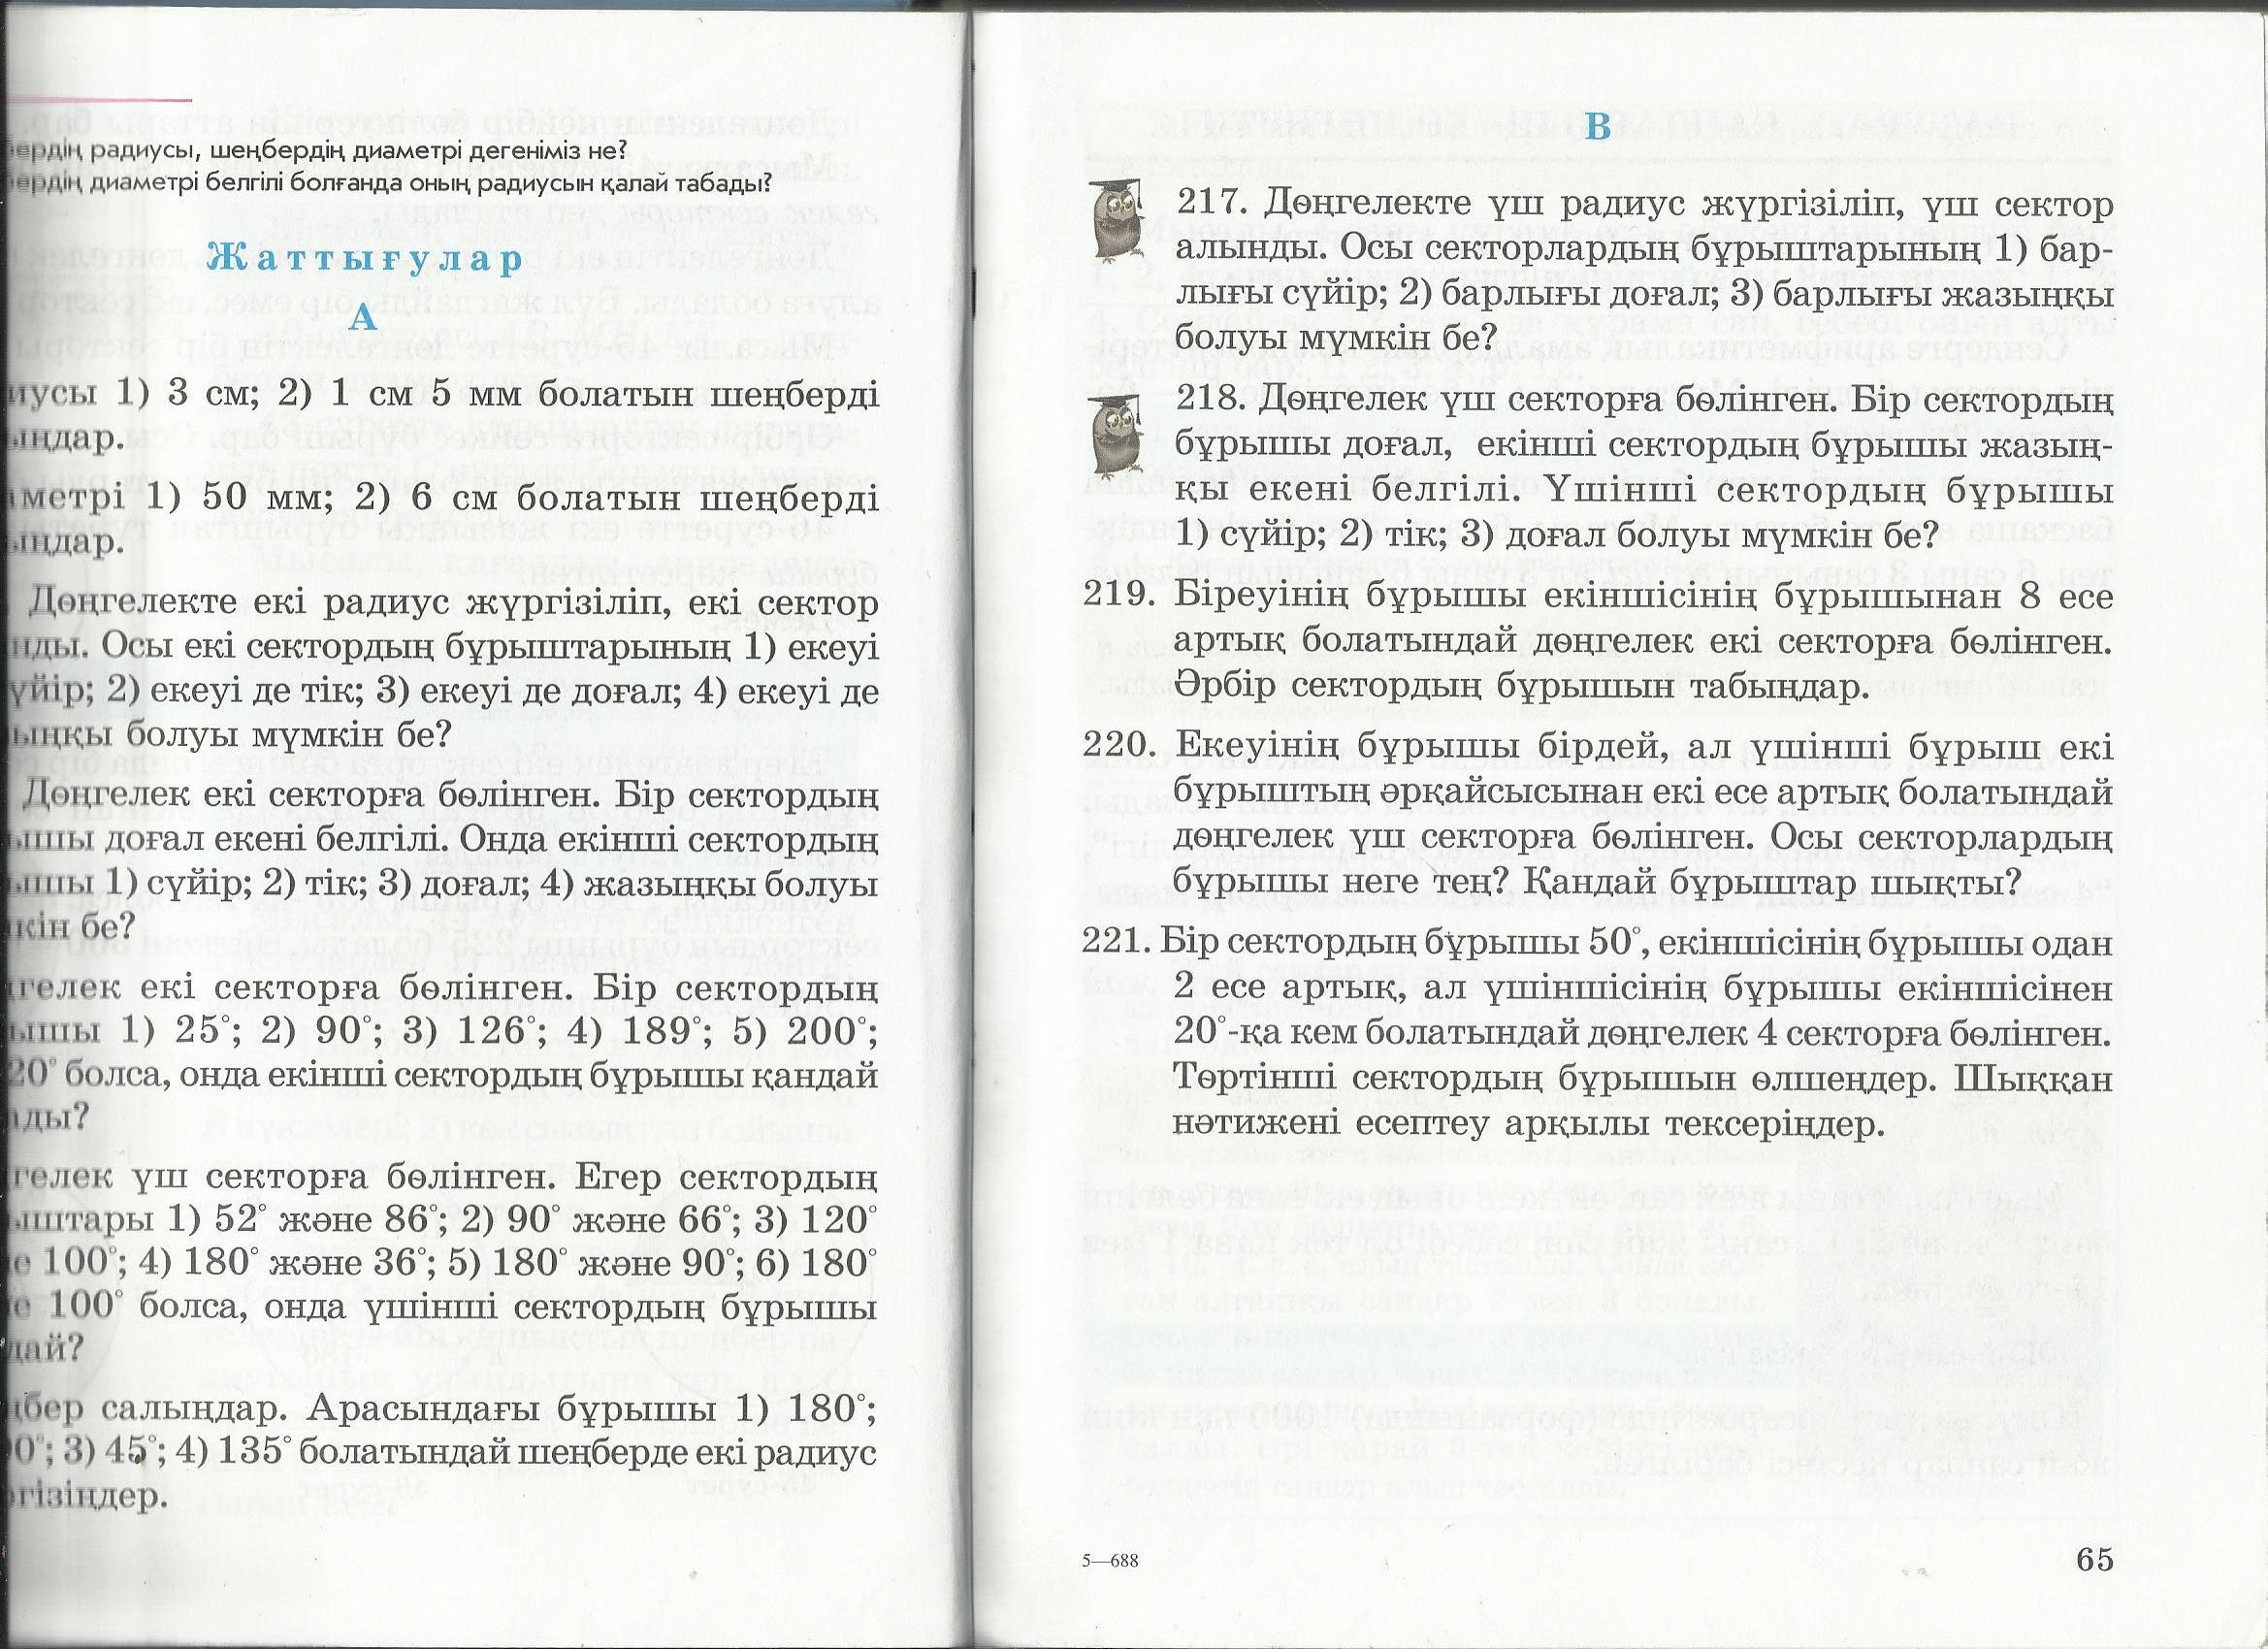 C:\Documents and Settings\Admin\Рабочий стол\Новая папка (5)\Математика\Изображение 080.jpg